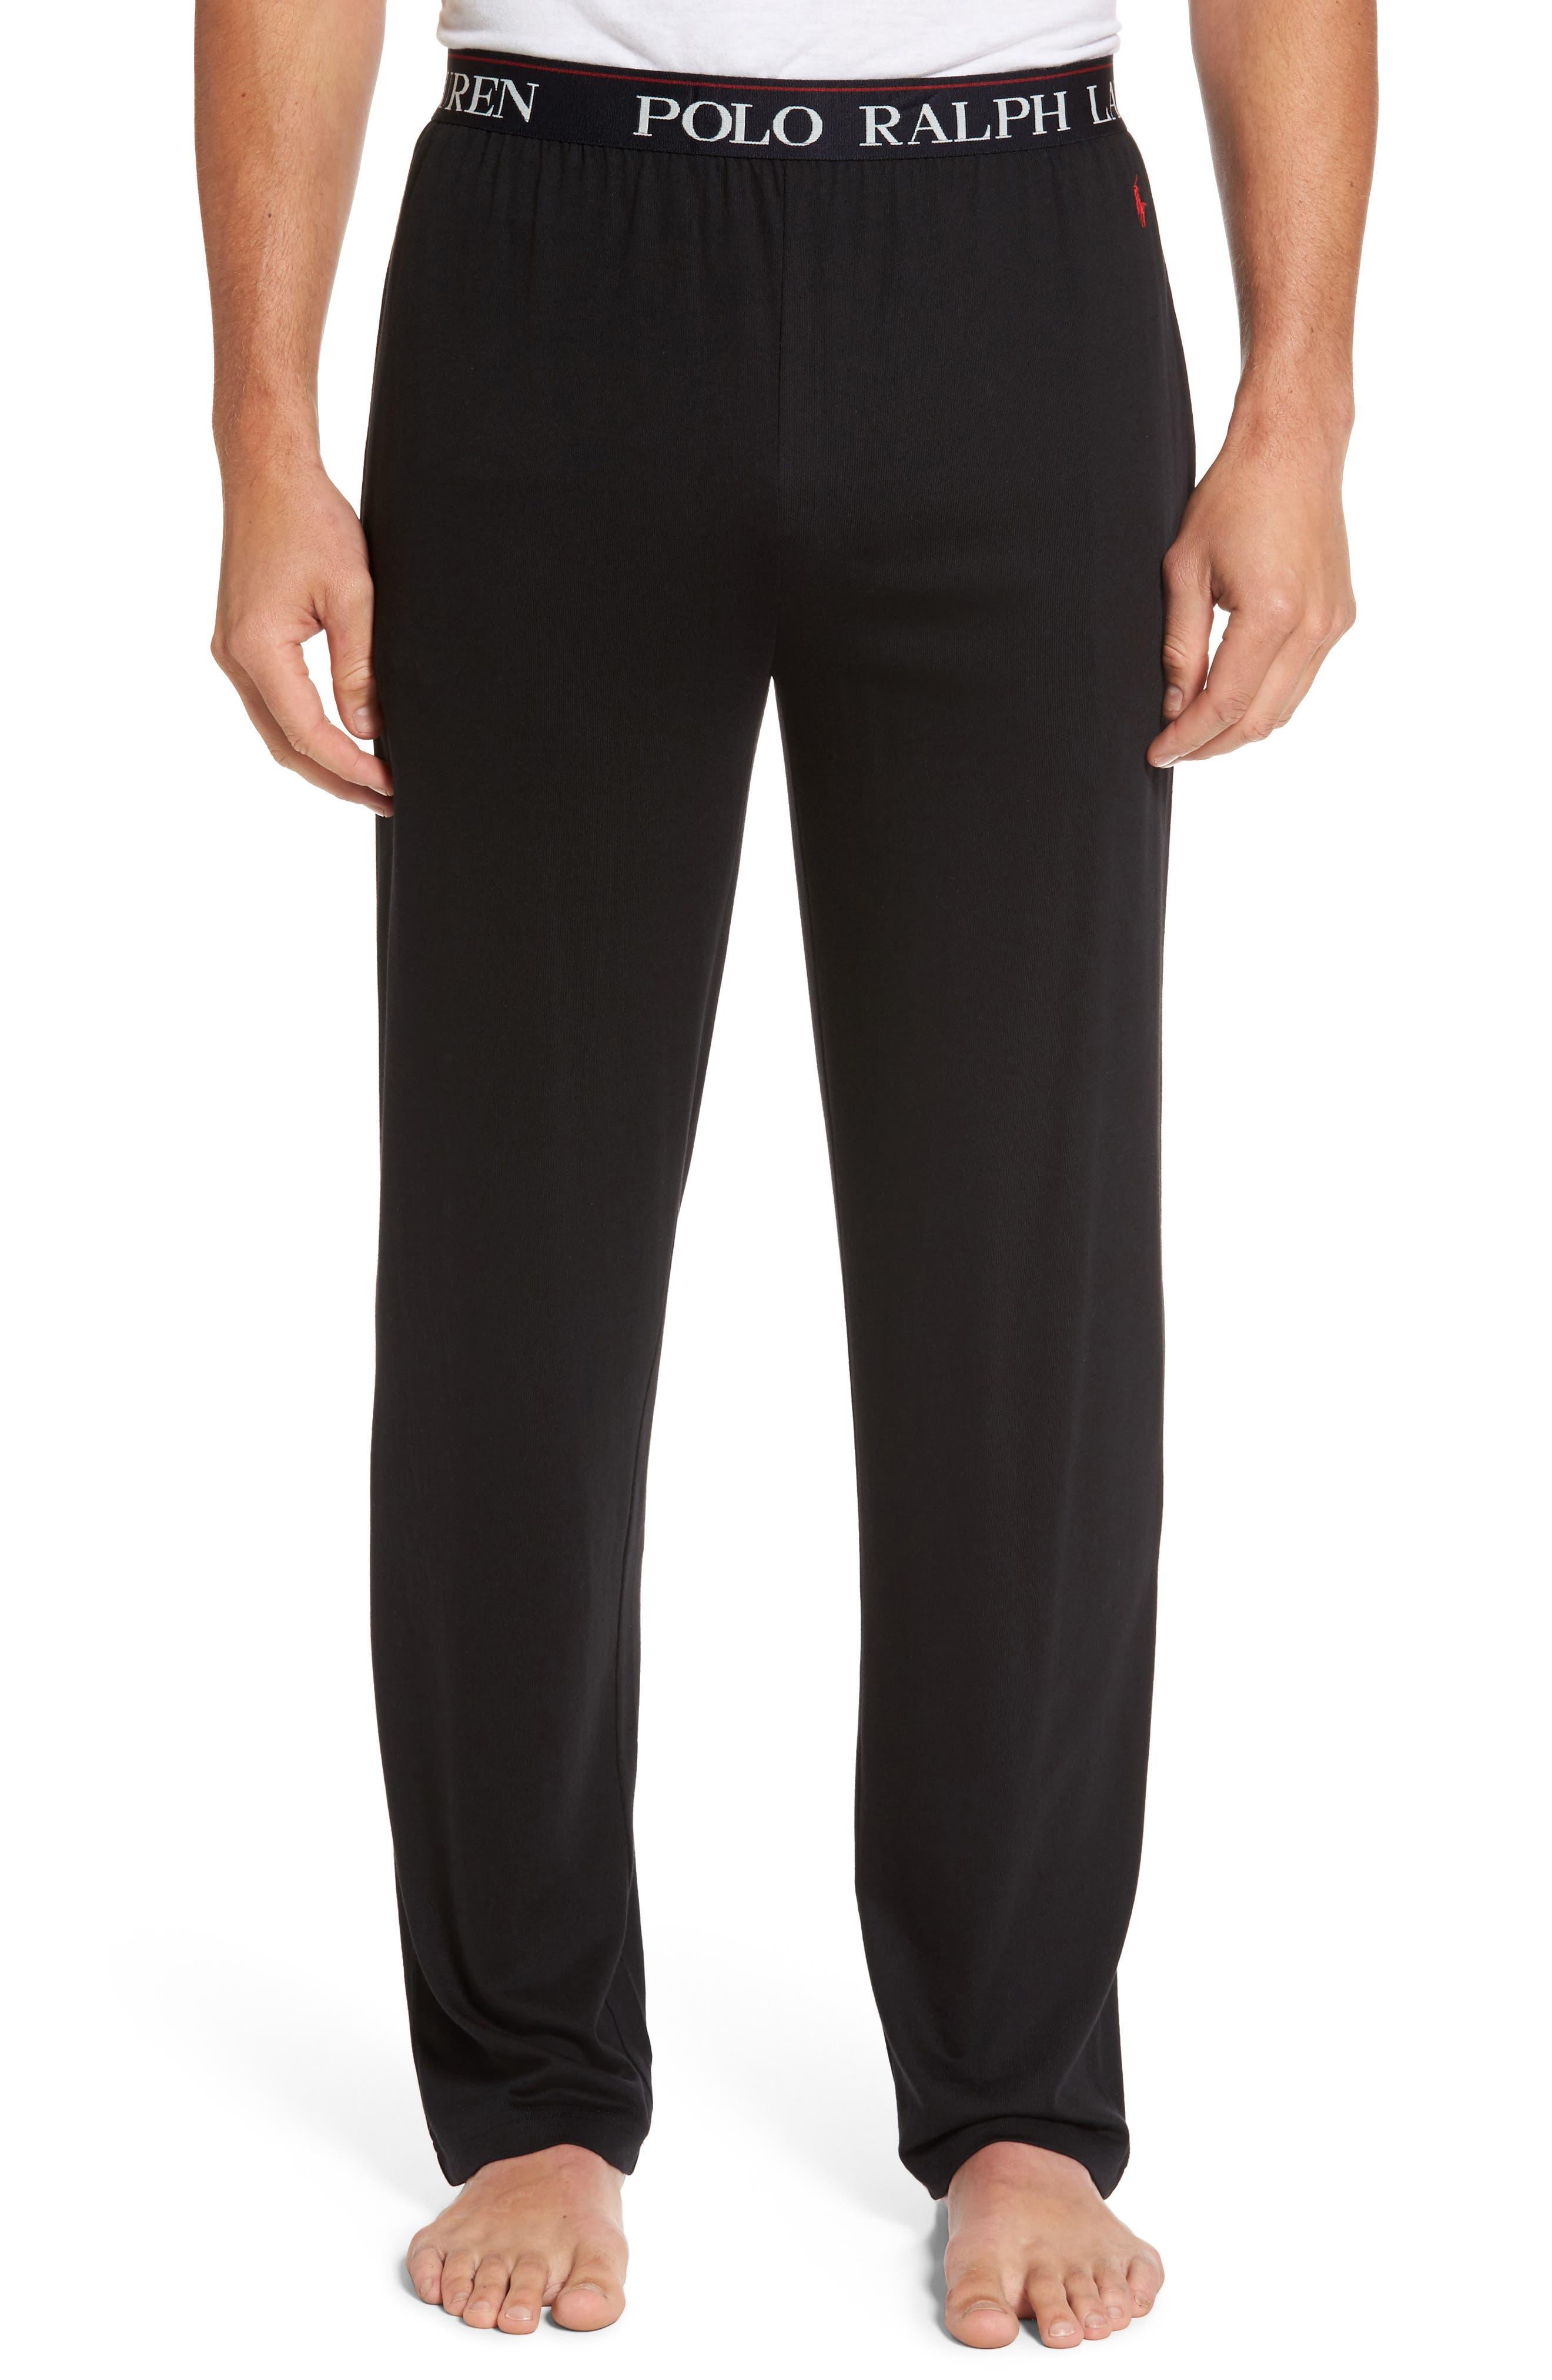 Cotton & Modal Lounge Pants,                         Main,                         color, POLO BLACK